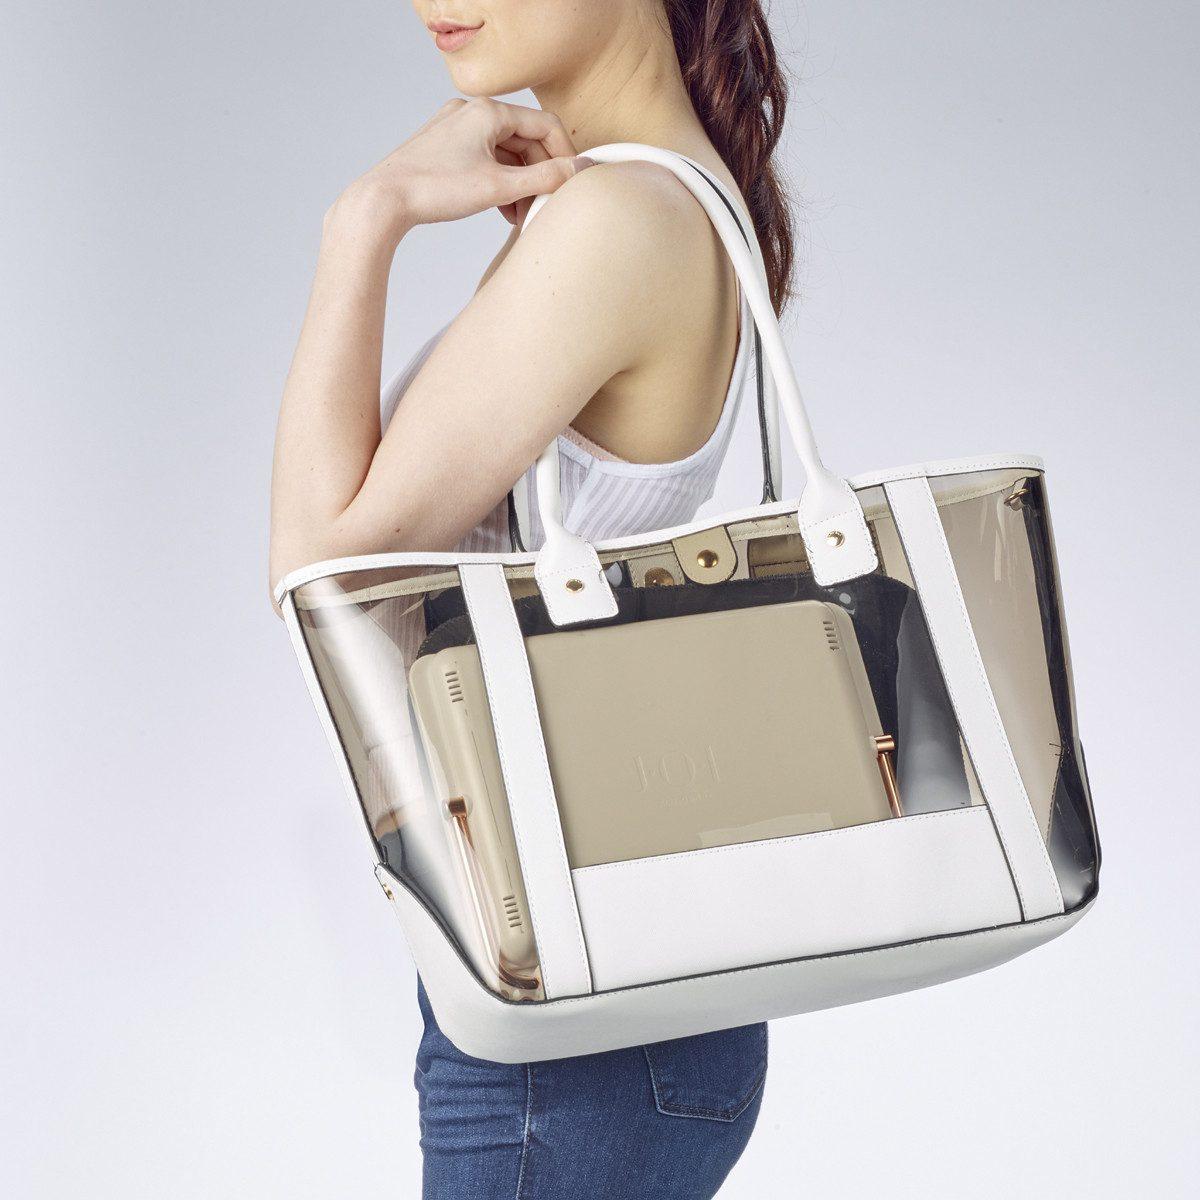 Spotlite HD Makeup Mirror LED Folds Up Laptop